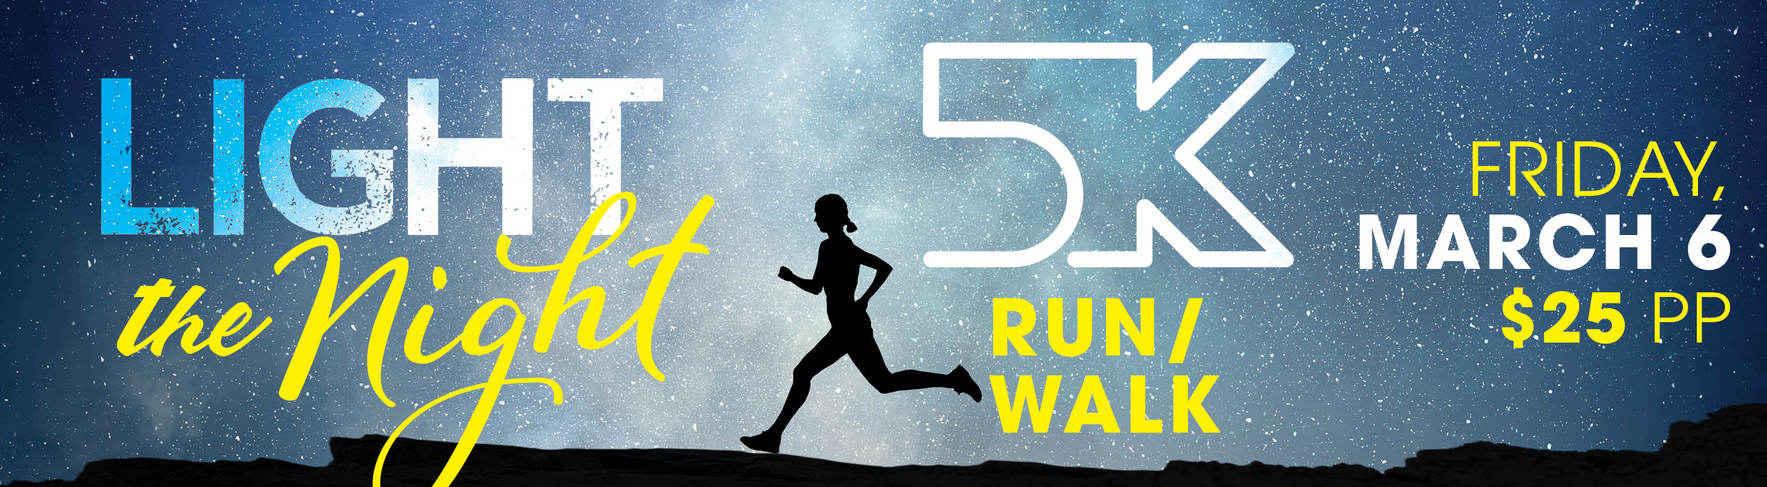 Light the Night 5K Run/Walk image